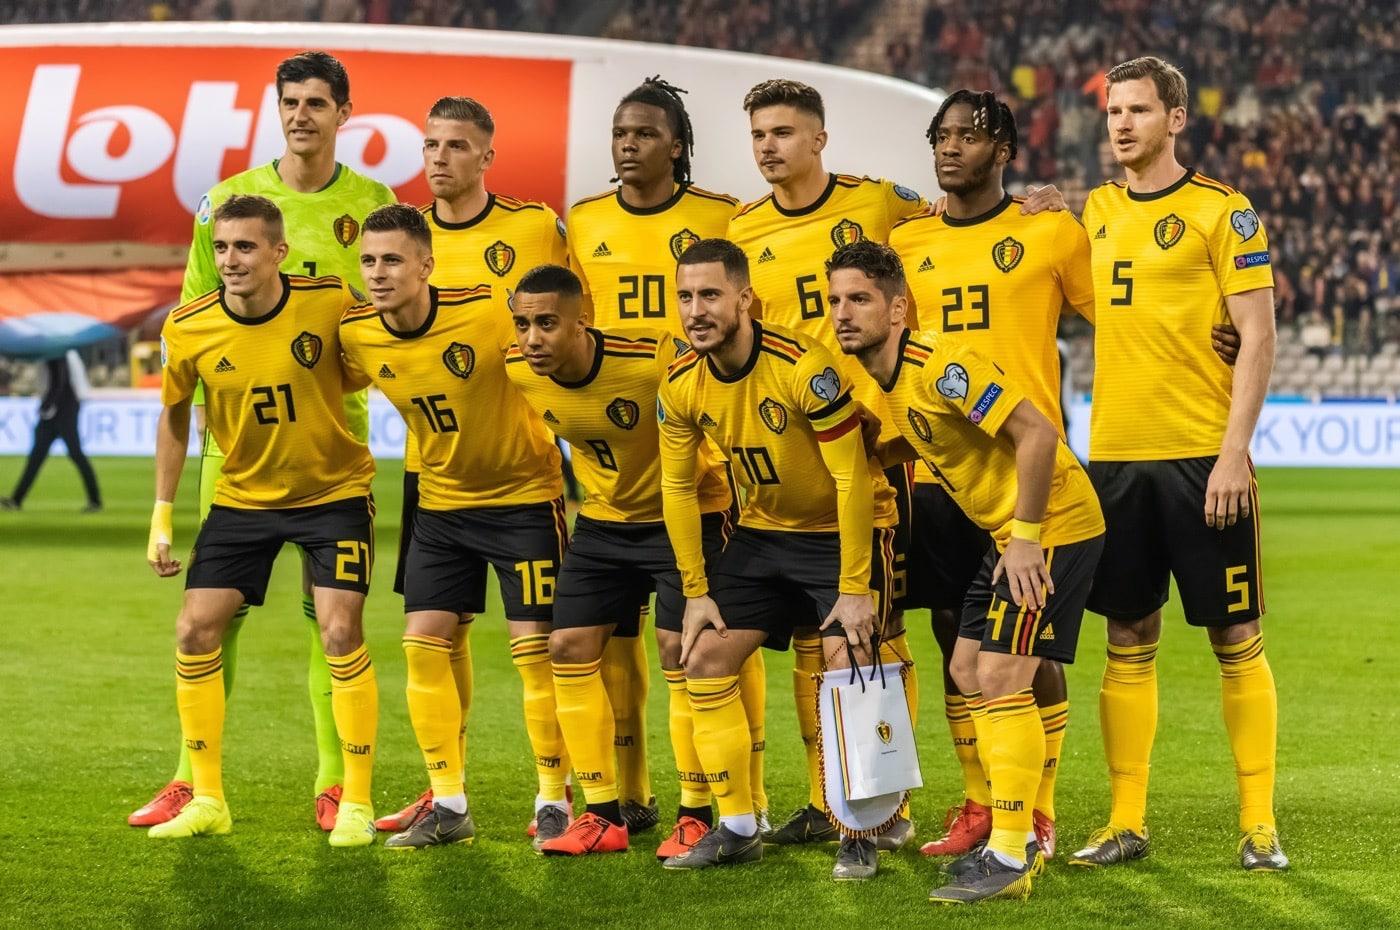 Die belgische Nationalmannschaft ist Favorit in der EM Endrundengruppe B (Foto Shutterstock)